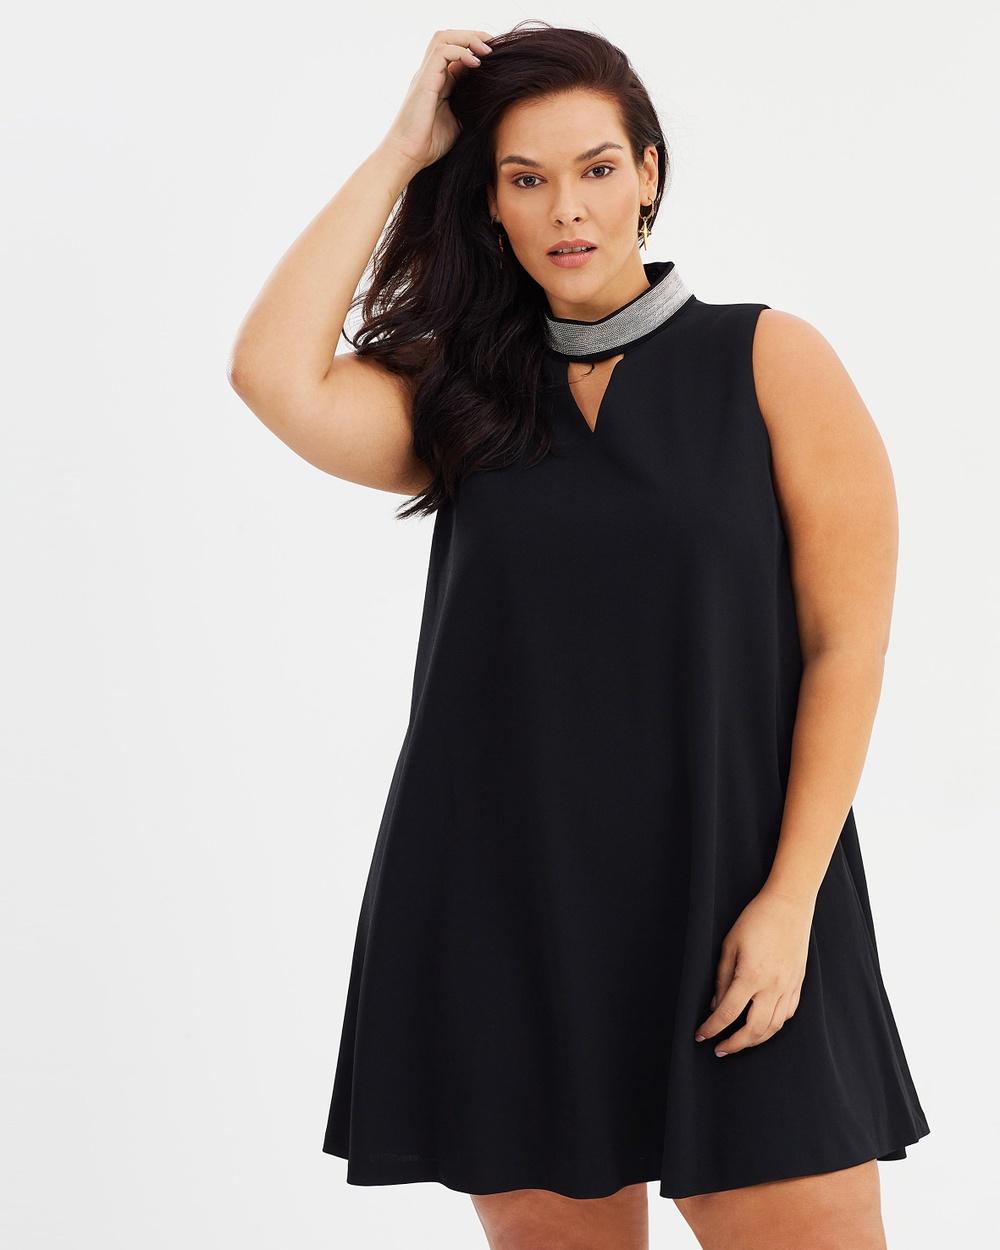 Rebel Wilson x Angels Beaded Choker Dress Dresses Black Beaded Choker Dress